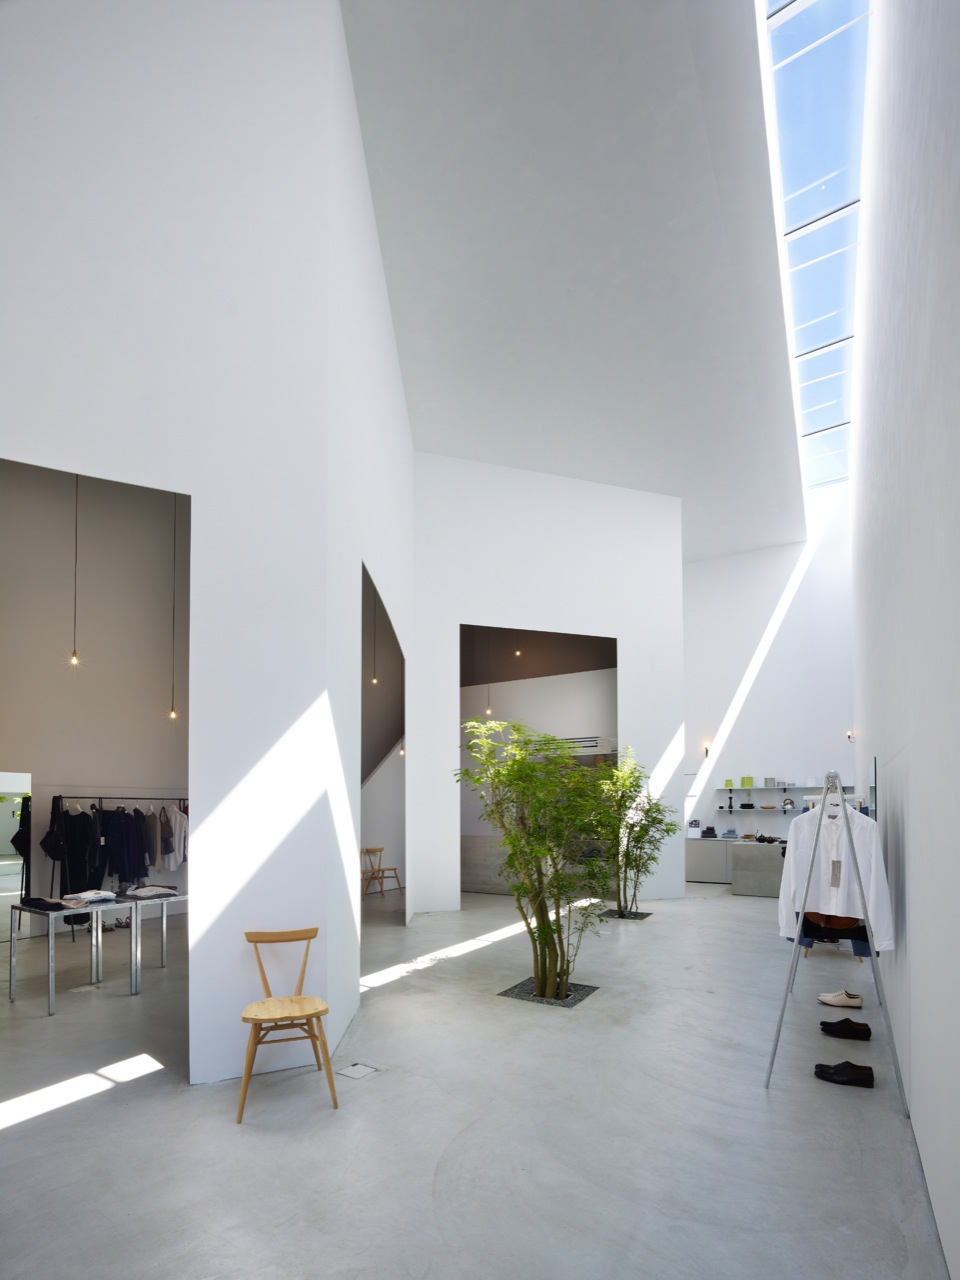 52 / Suppose Design Office, © Toshiyuki Yano